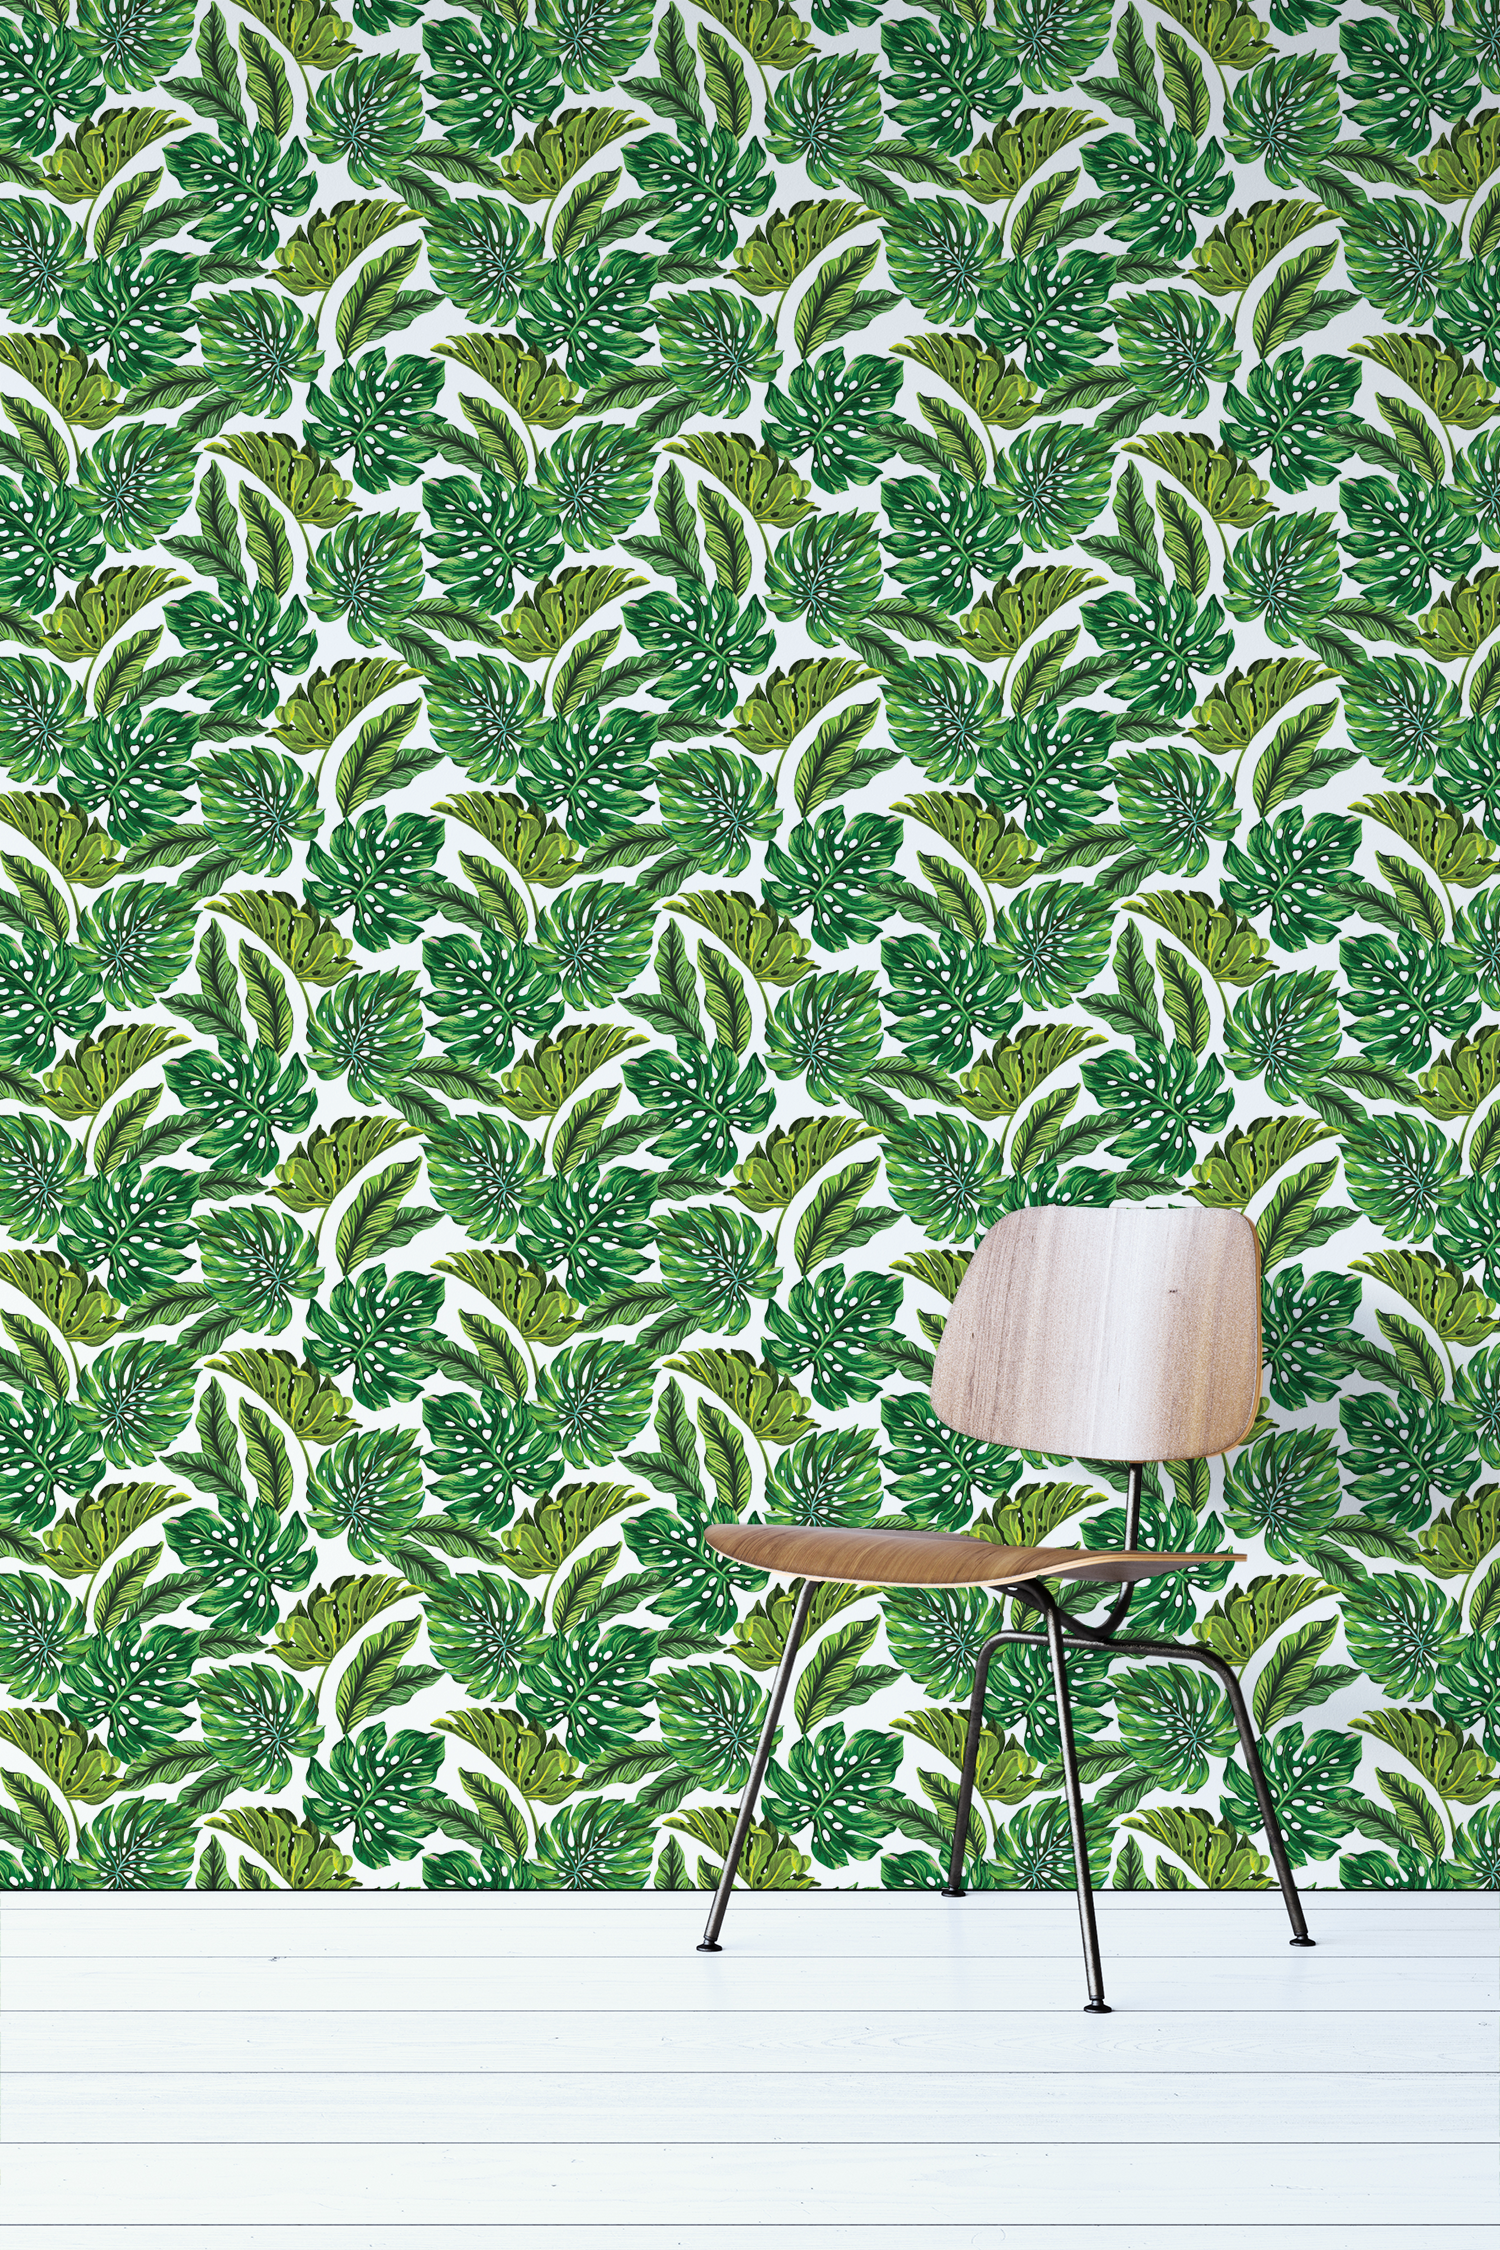 Bohemian Wallpaper With Green Leaves Wallflorashopcom 1500x2250